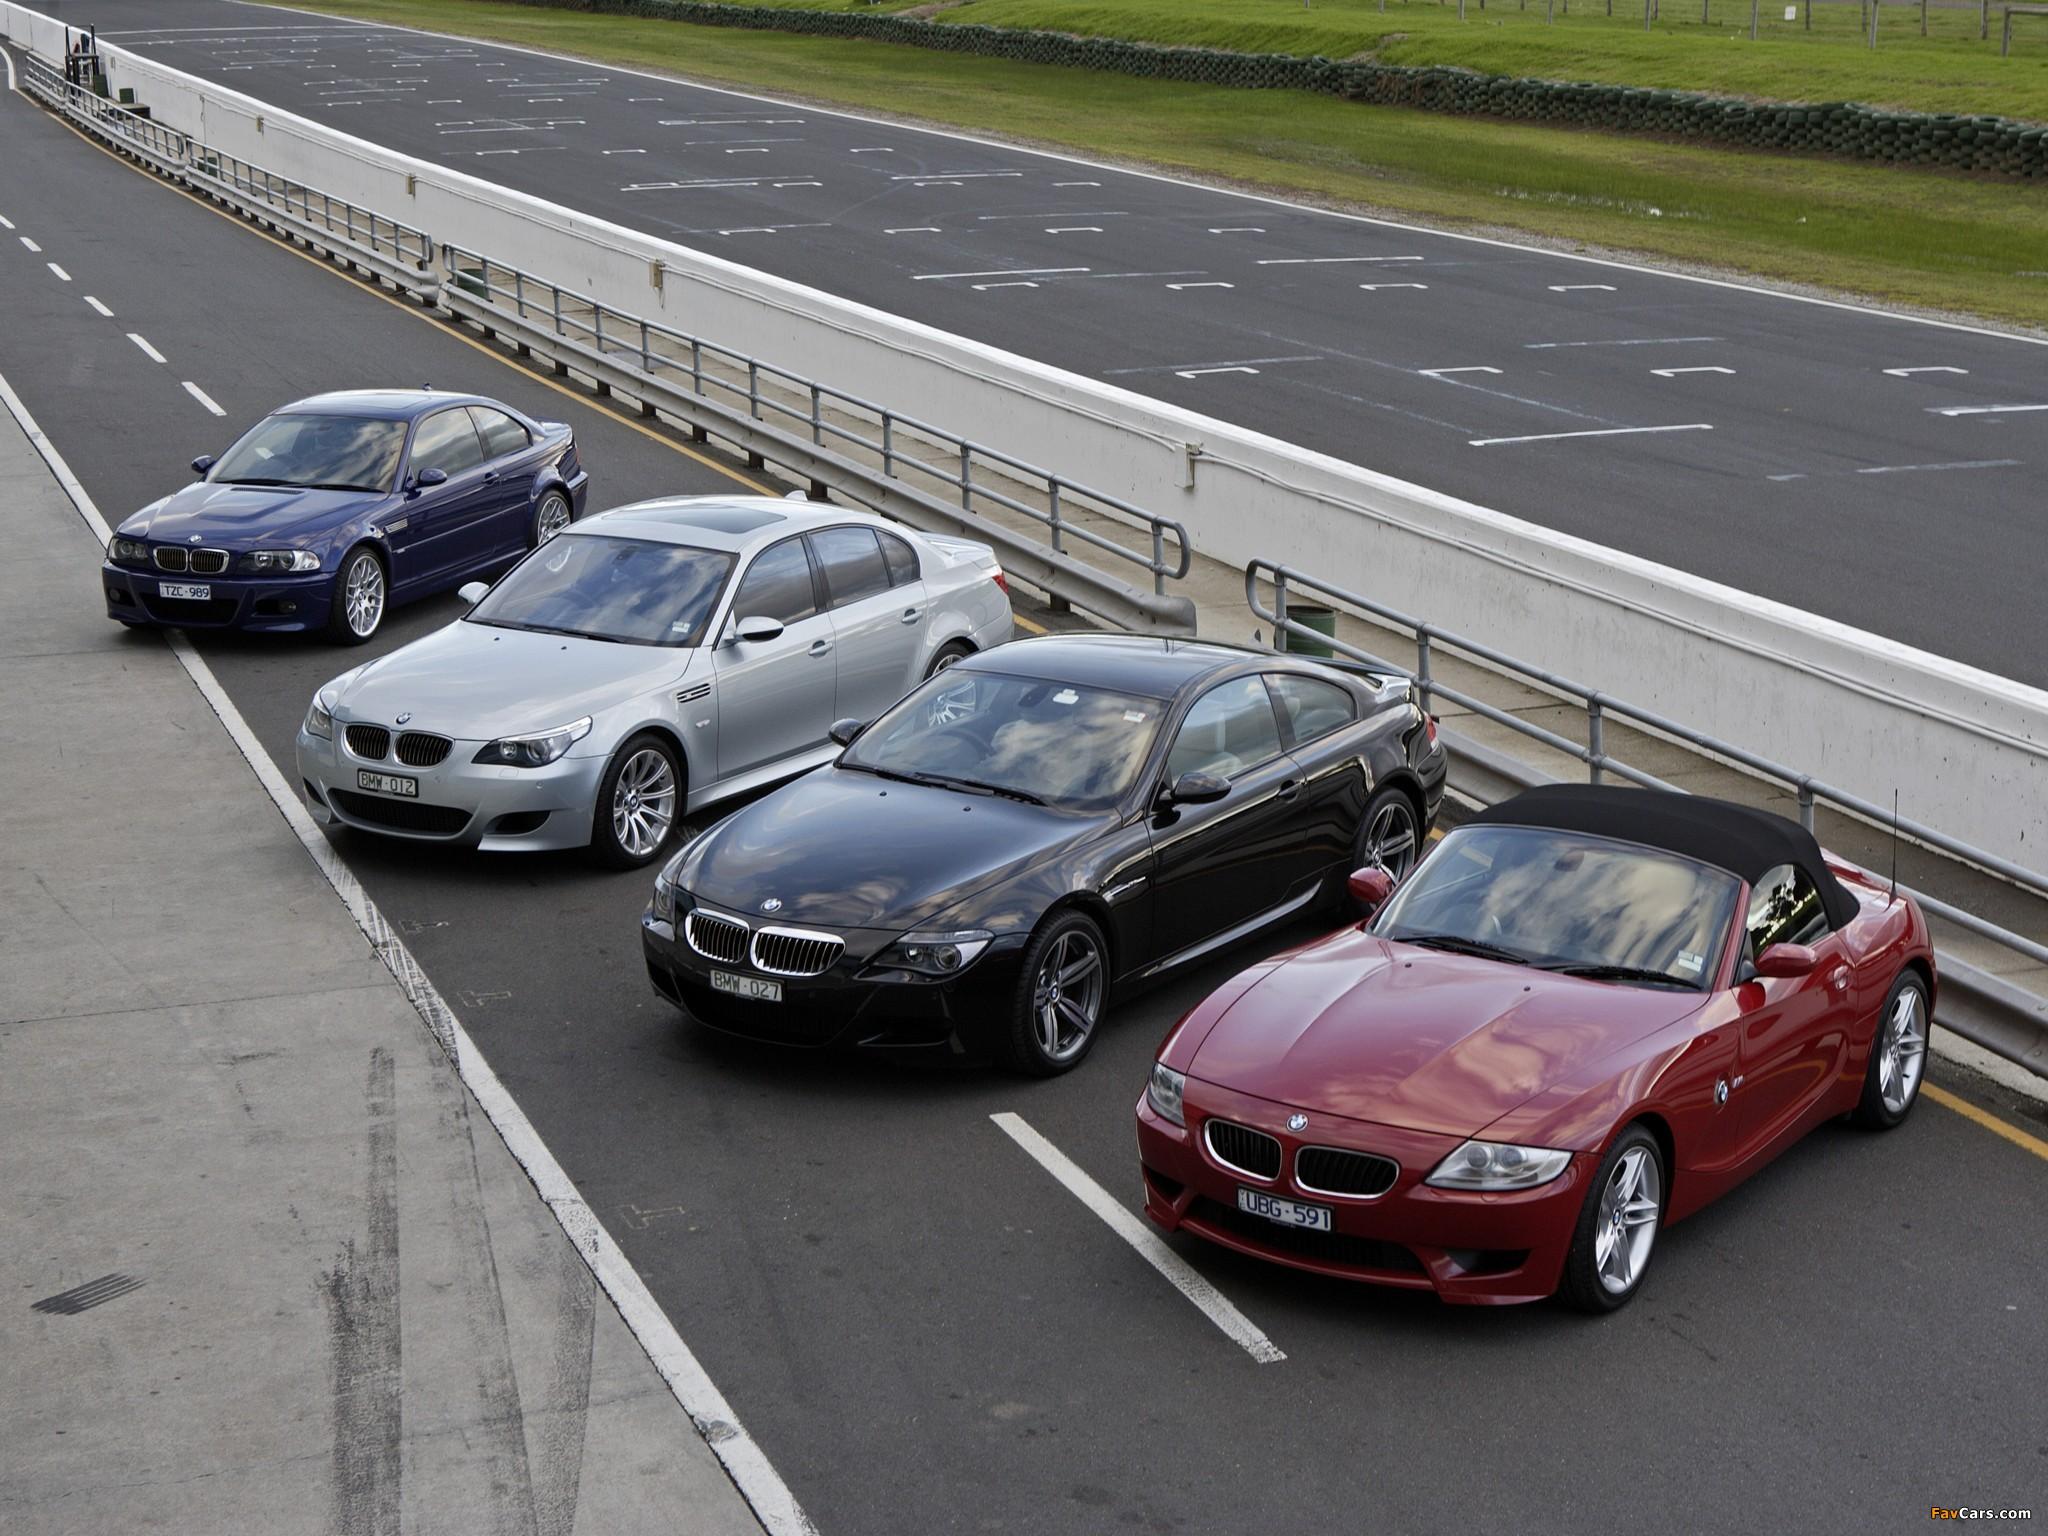 BMW images (2048 x 1536)